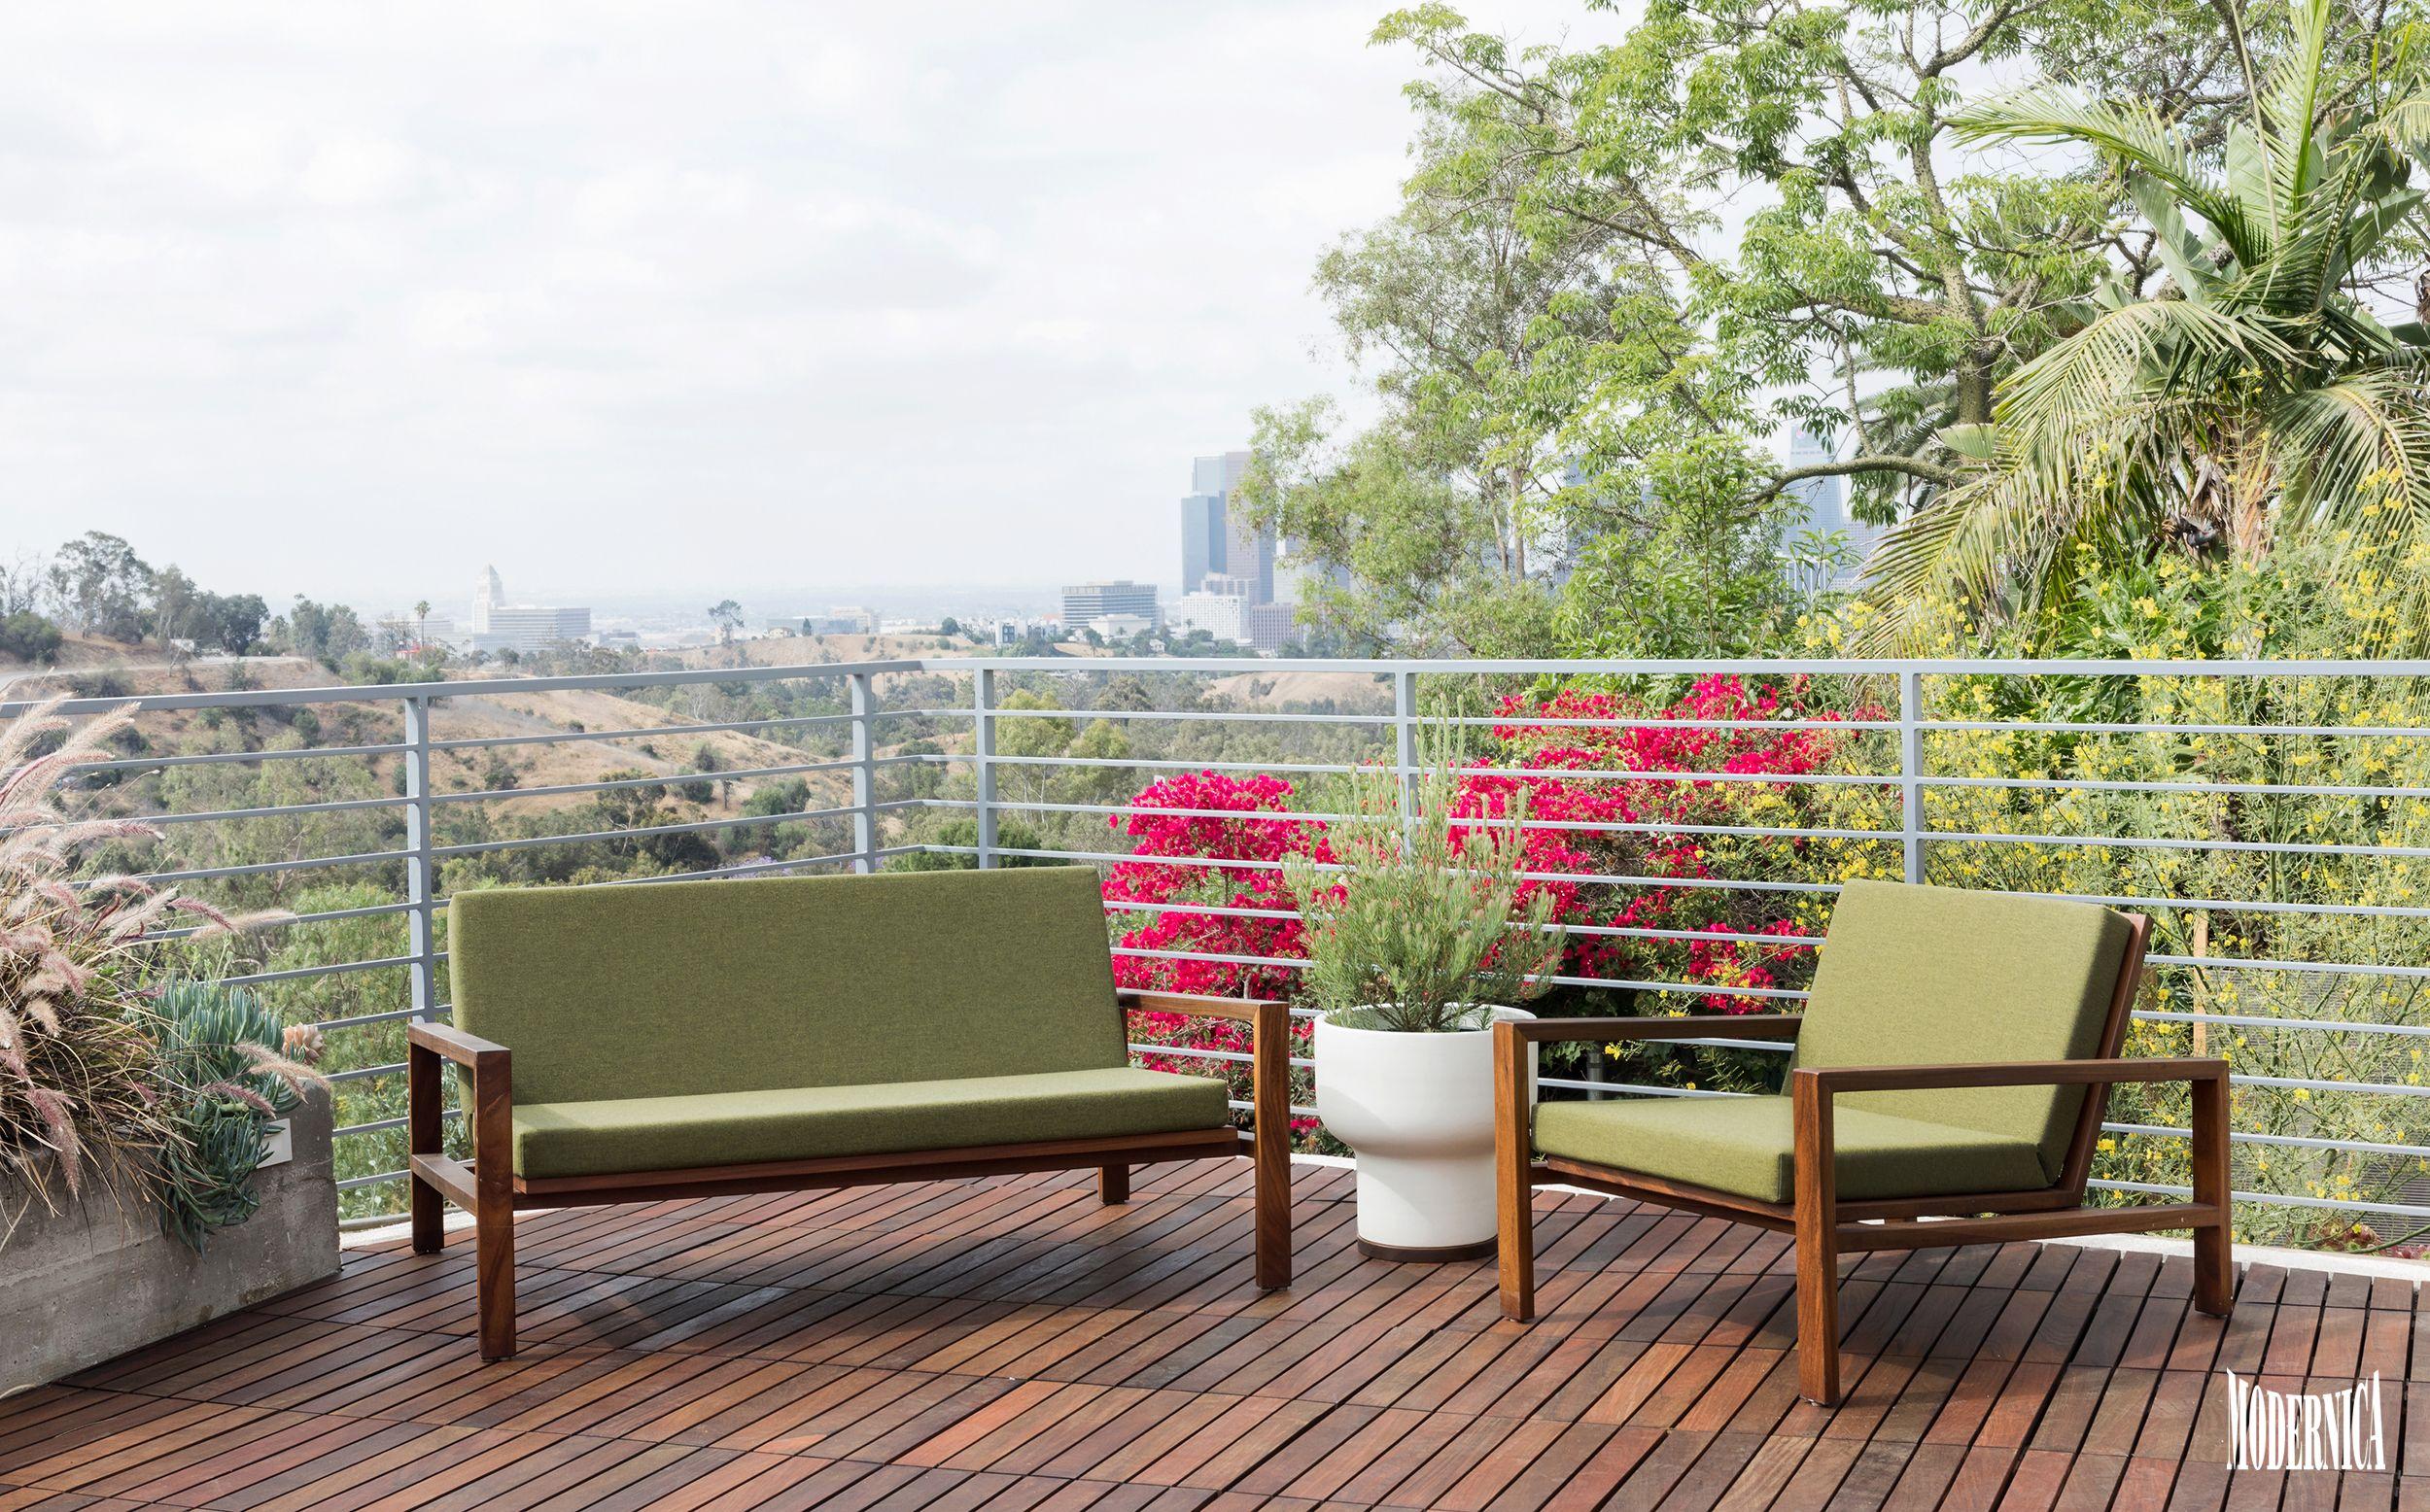 Modernica case study outdoor furniture